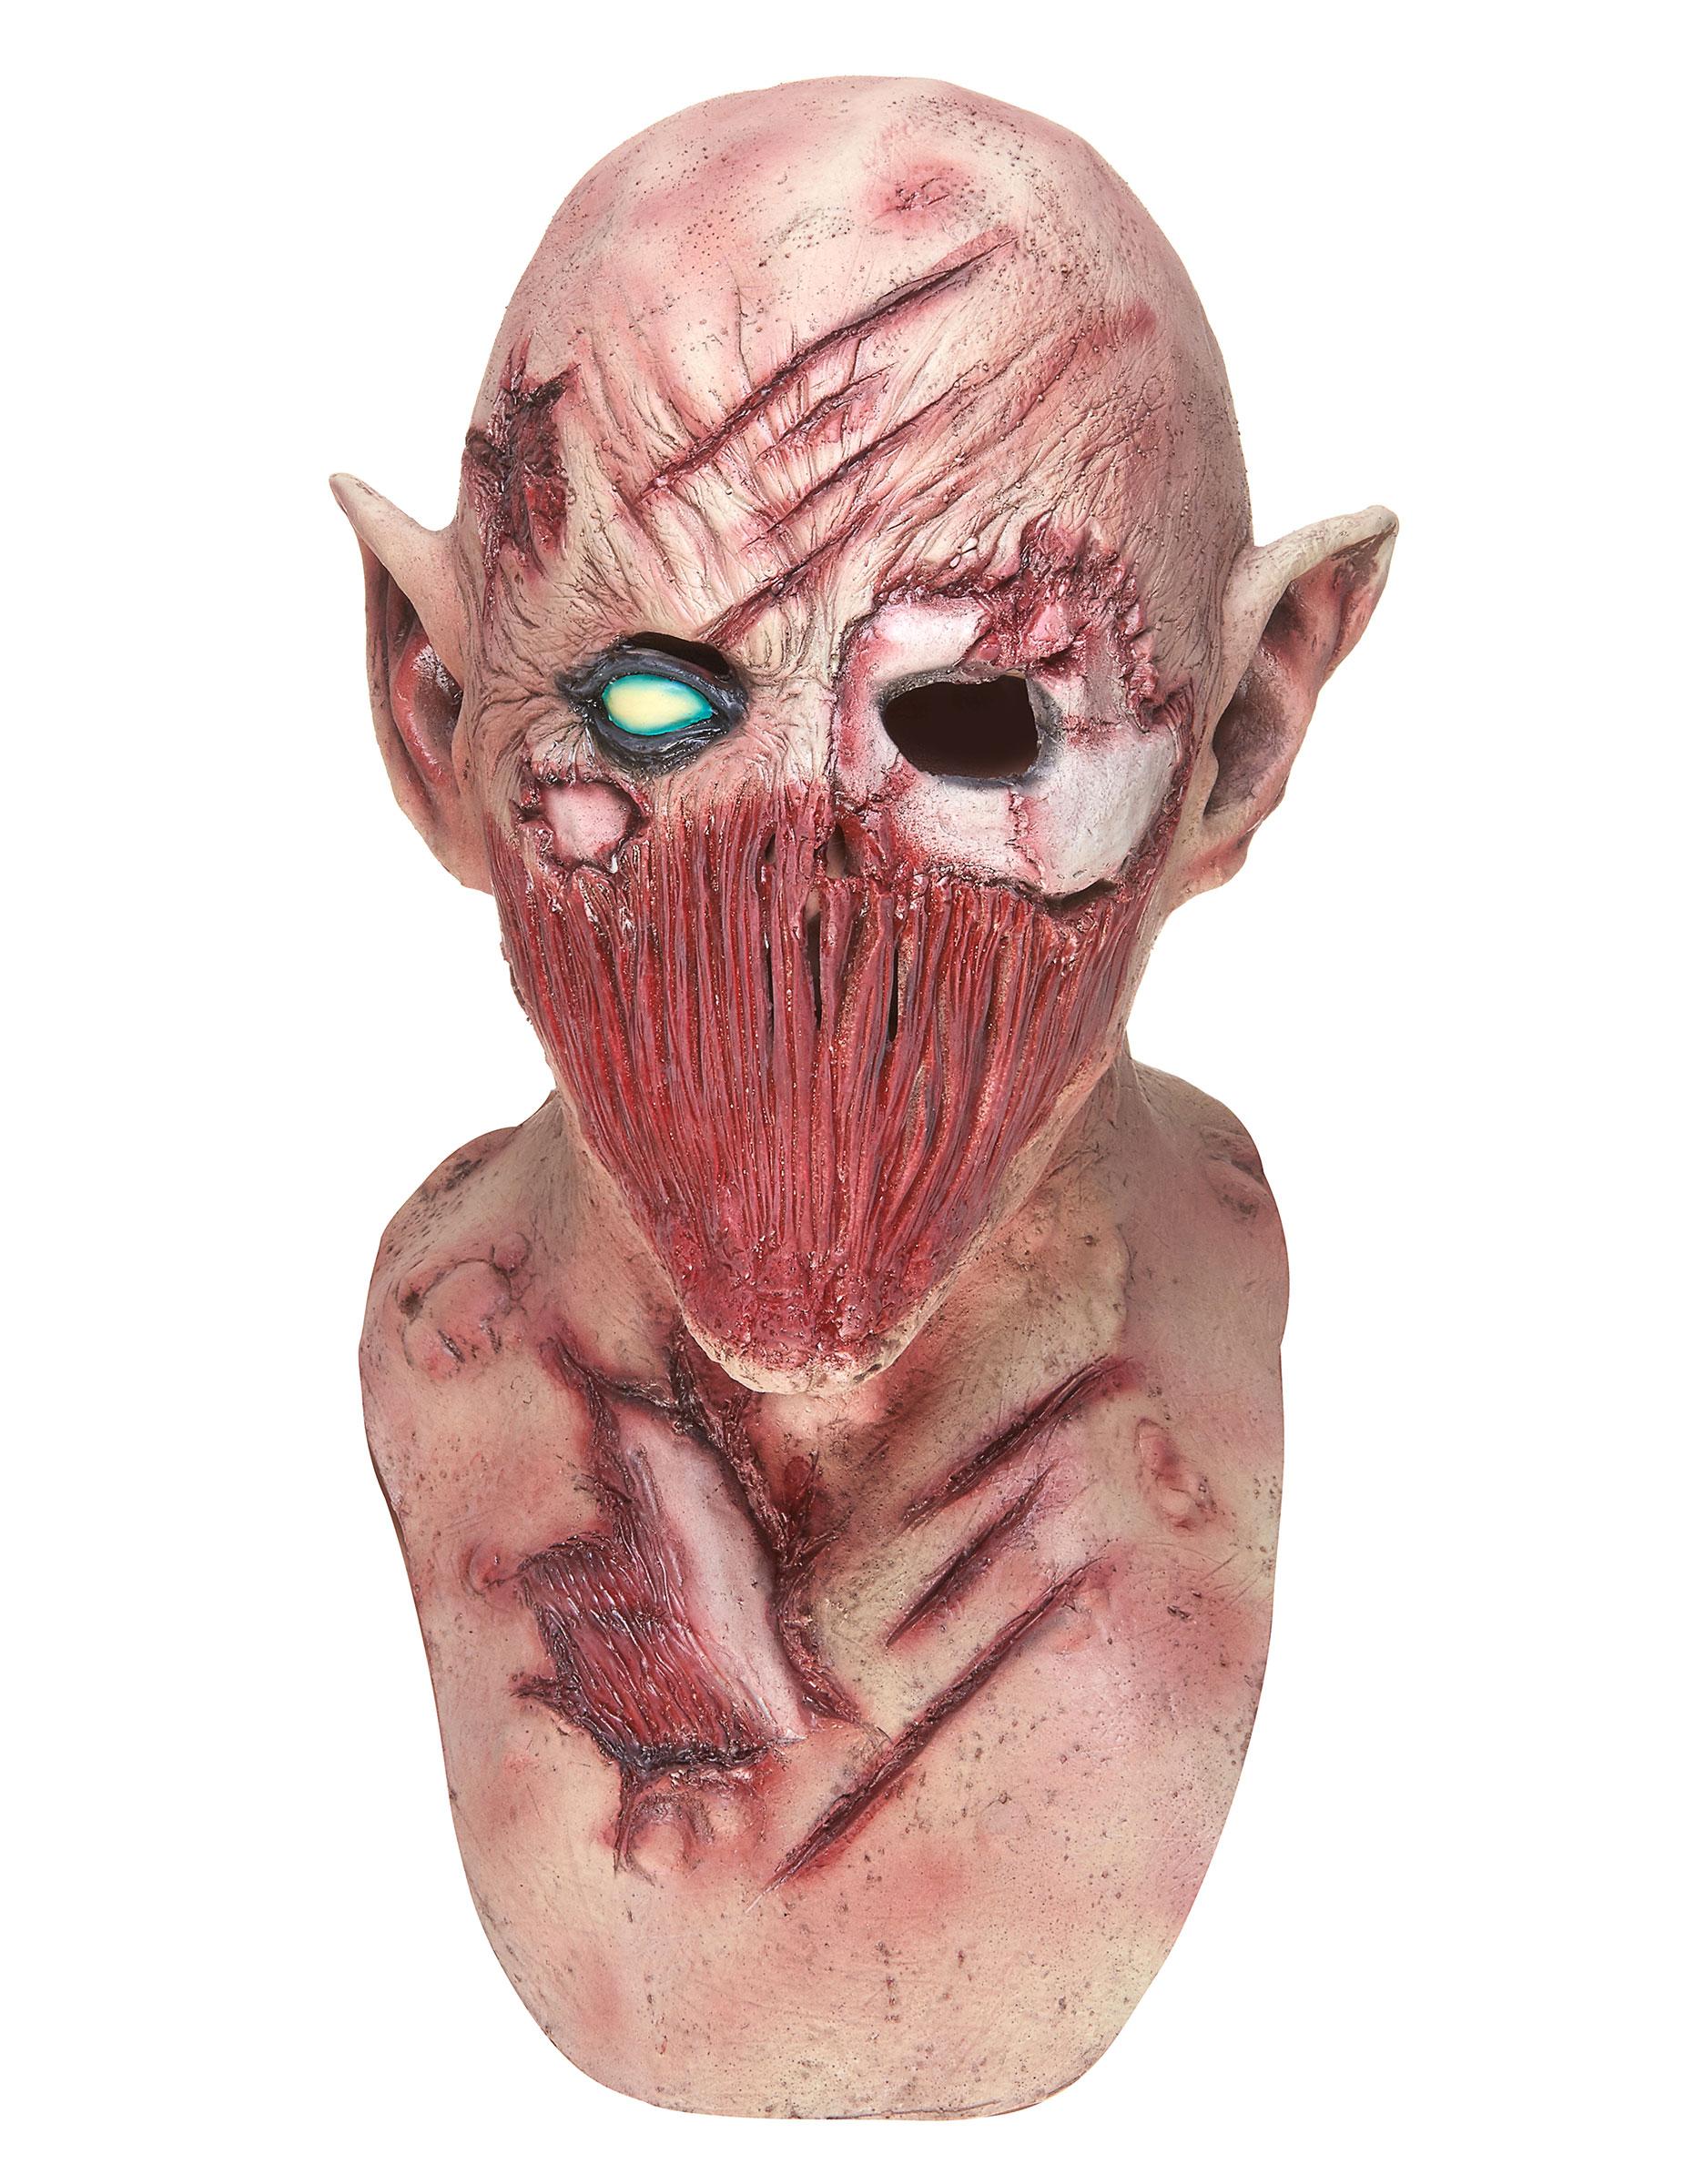 Masques entiers de dguisements : masques en latex